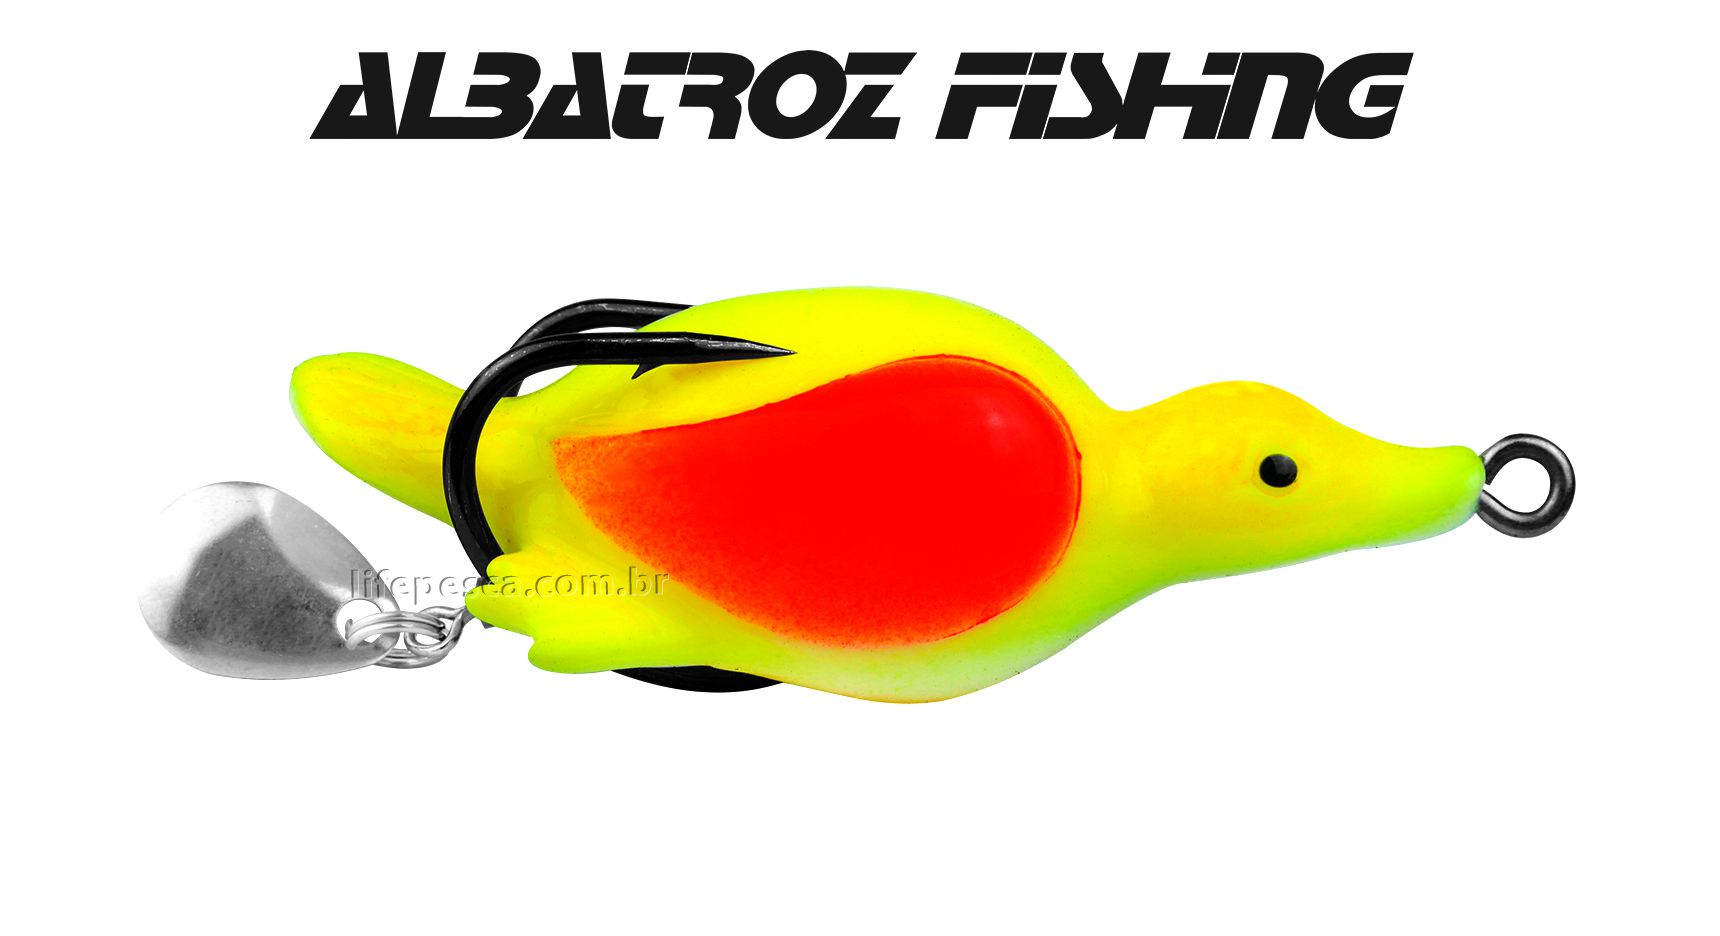 Isca Artificial Albatroz Fishing Top Duck XY-55 - 5,5cm (13g) - Várias Cores